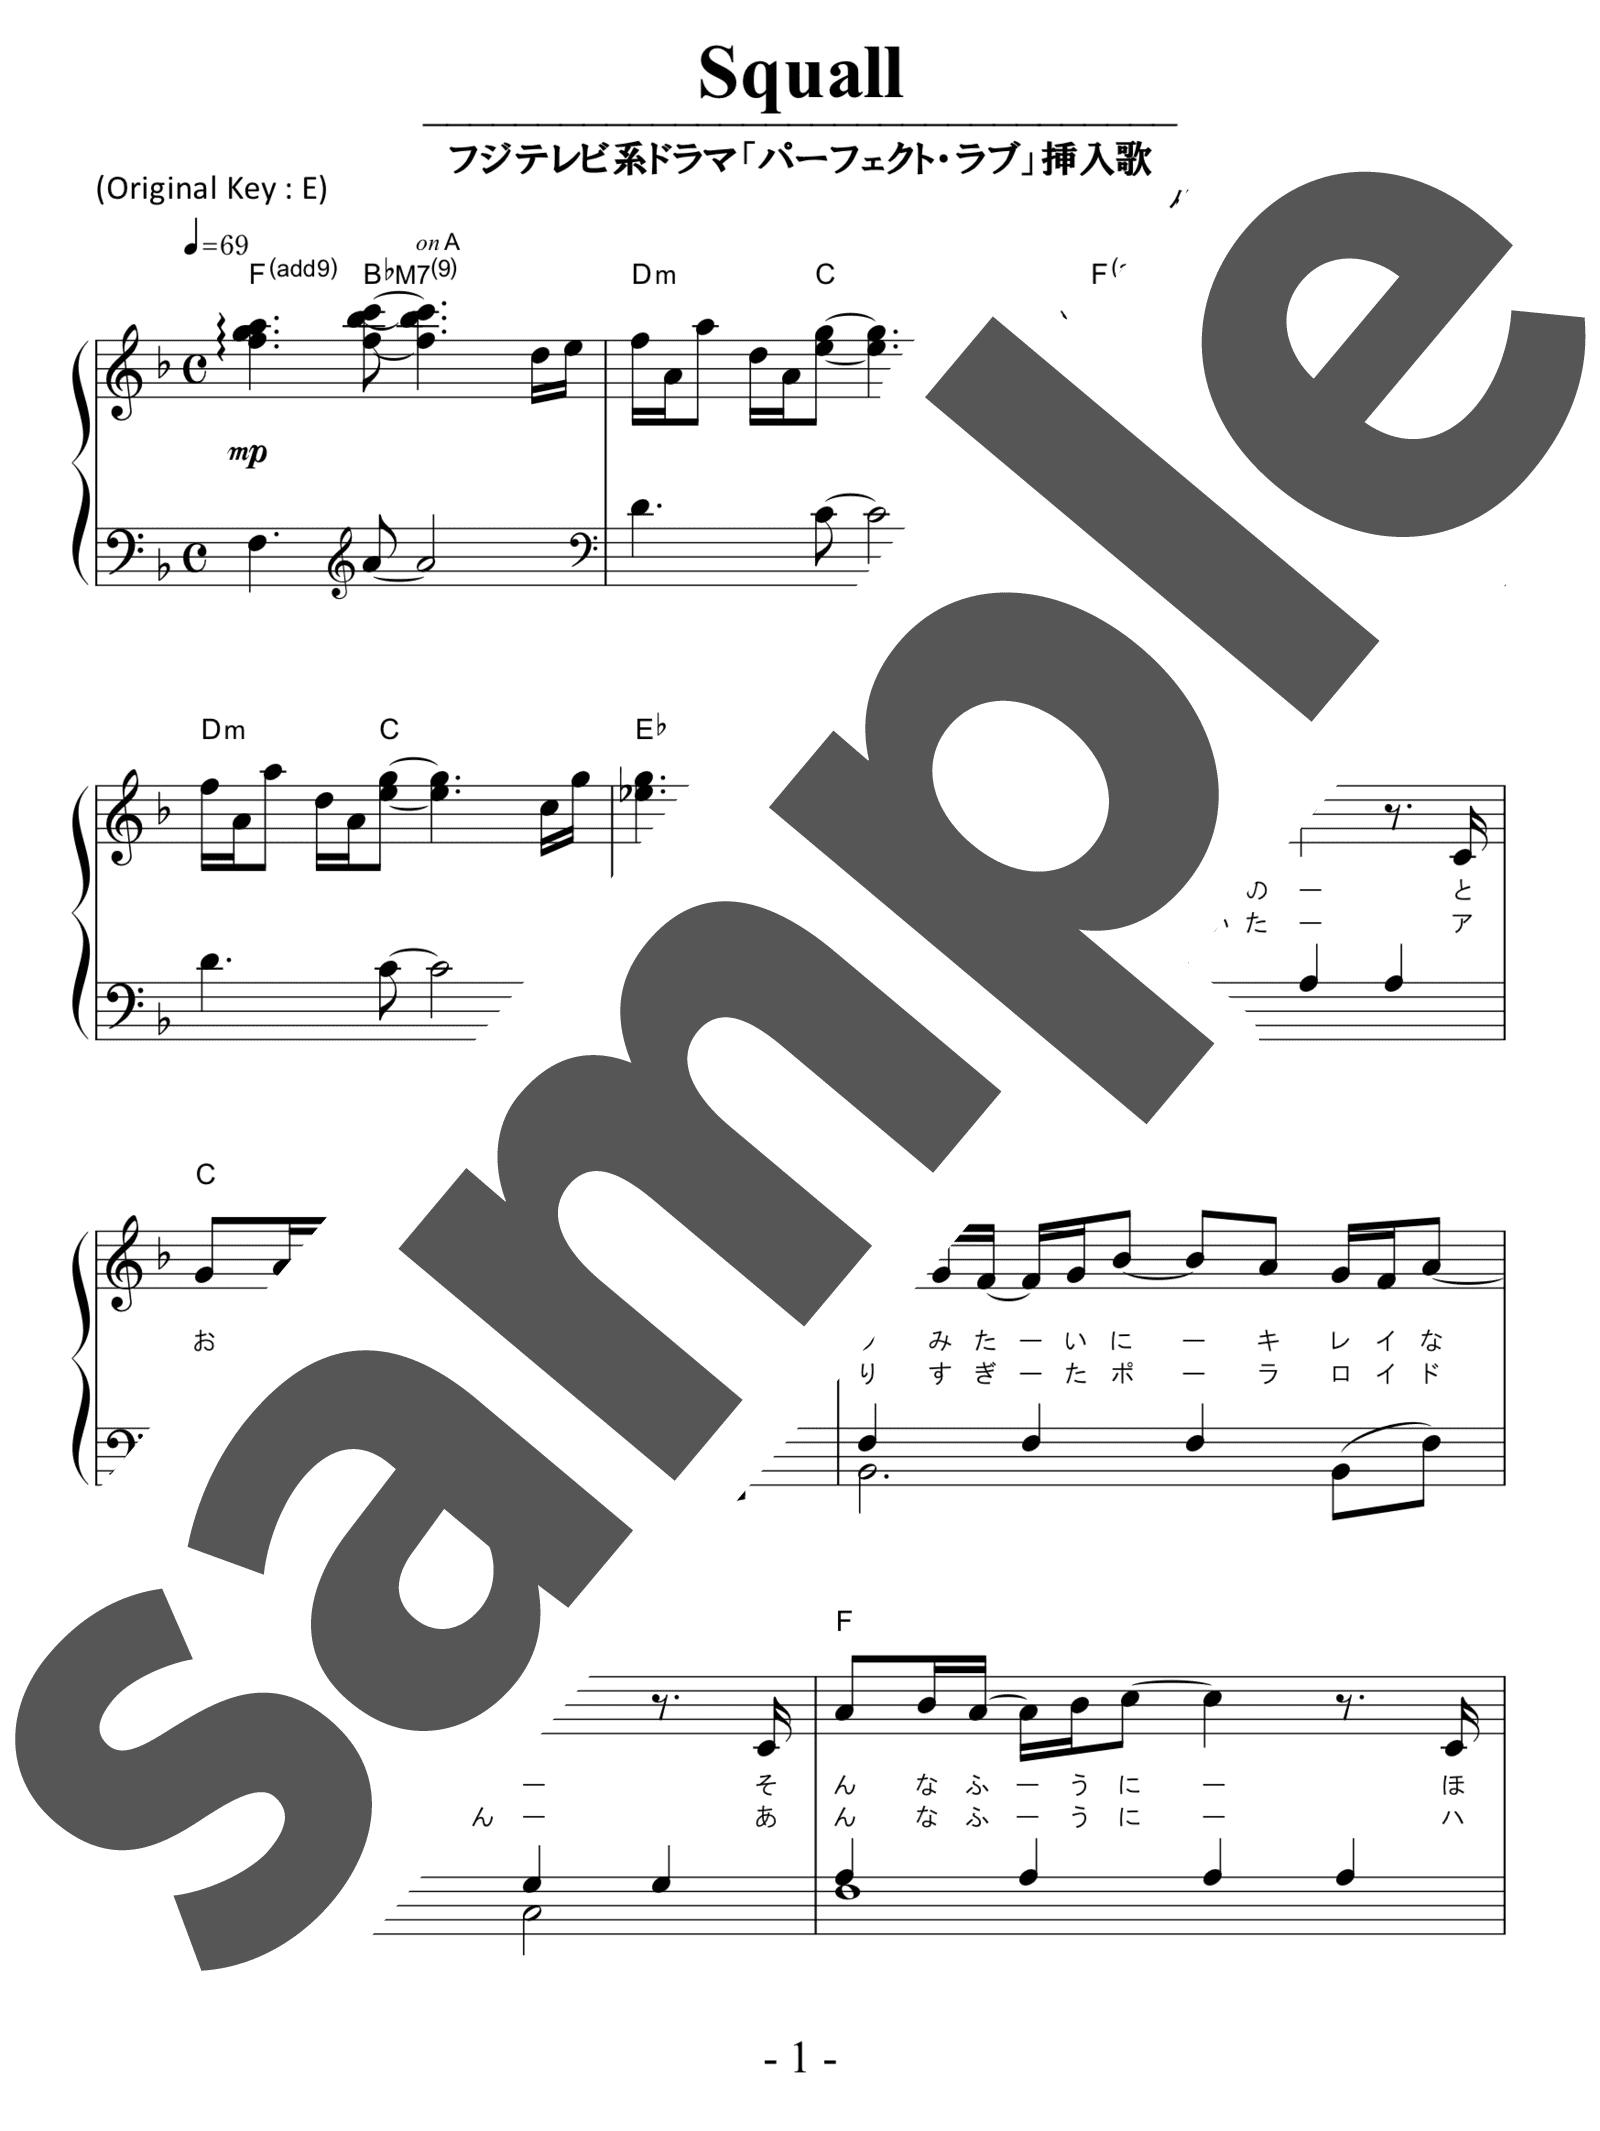 「Squall」のサンプル楽譜